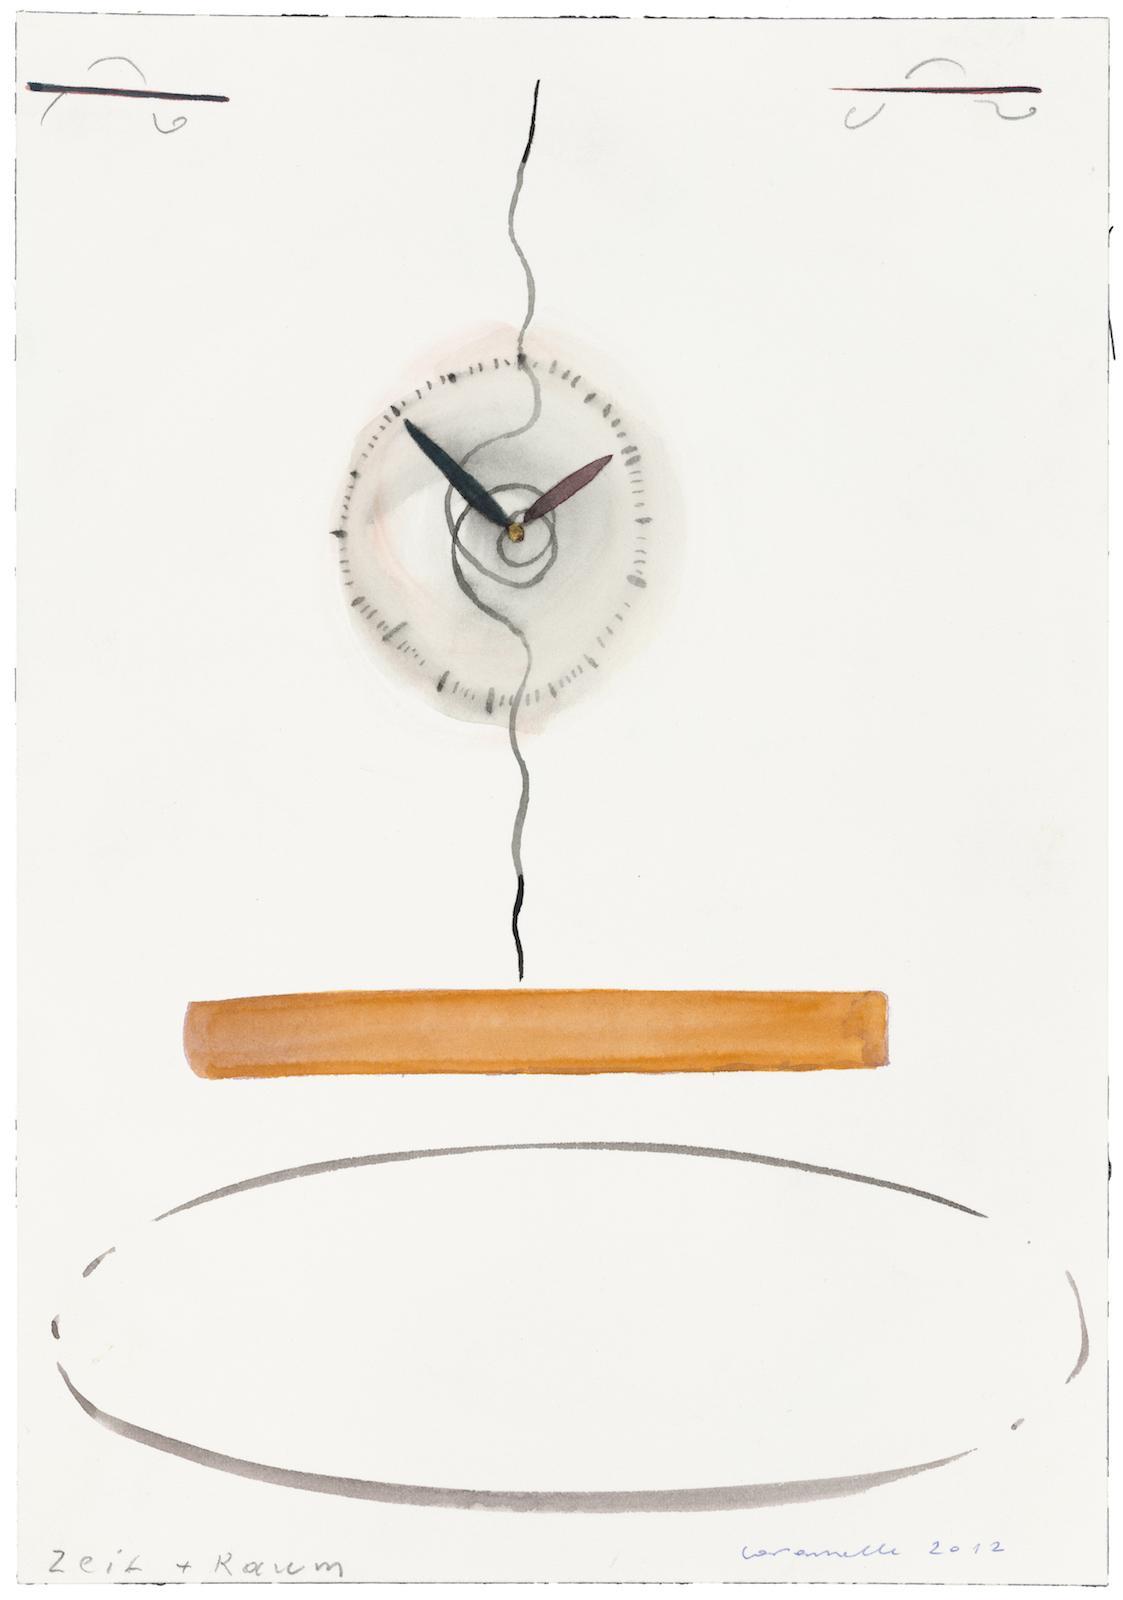 Ernst Caramelle Zeit + Raum (2012) watercolor on paper 26 x 18 cm Photo: Markus Wörgötter;Courtesy Galerie nächst St.Stephan Rosemarie Schwarzwälder